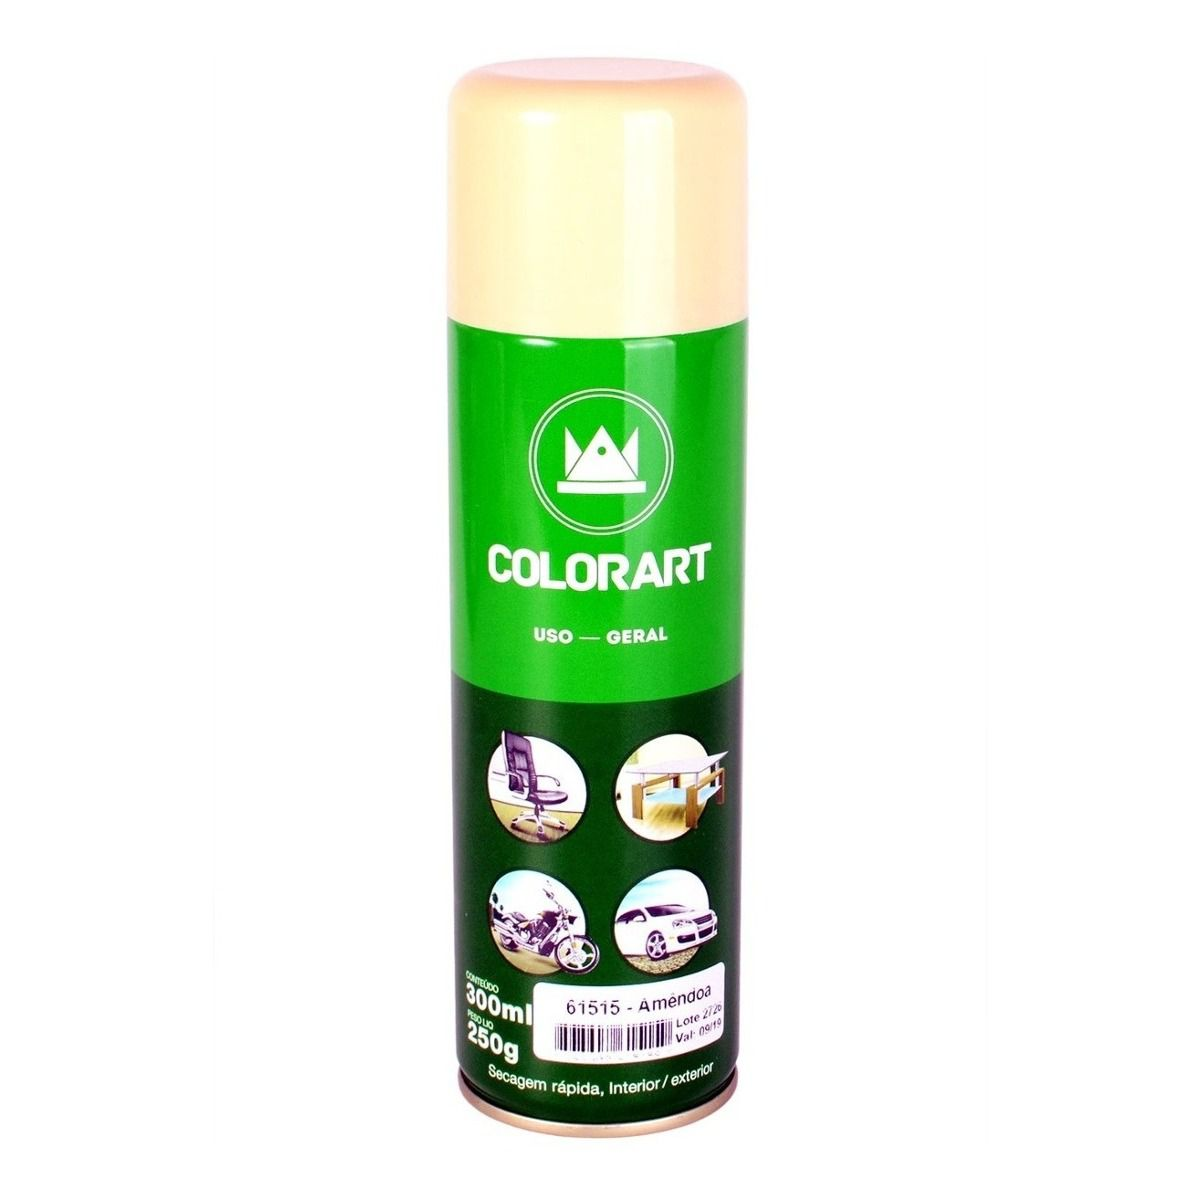 Tinta Spray Uso Geral Colorart Amêndoa  - Rea Comércio - Sua Loja Completa!